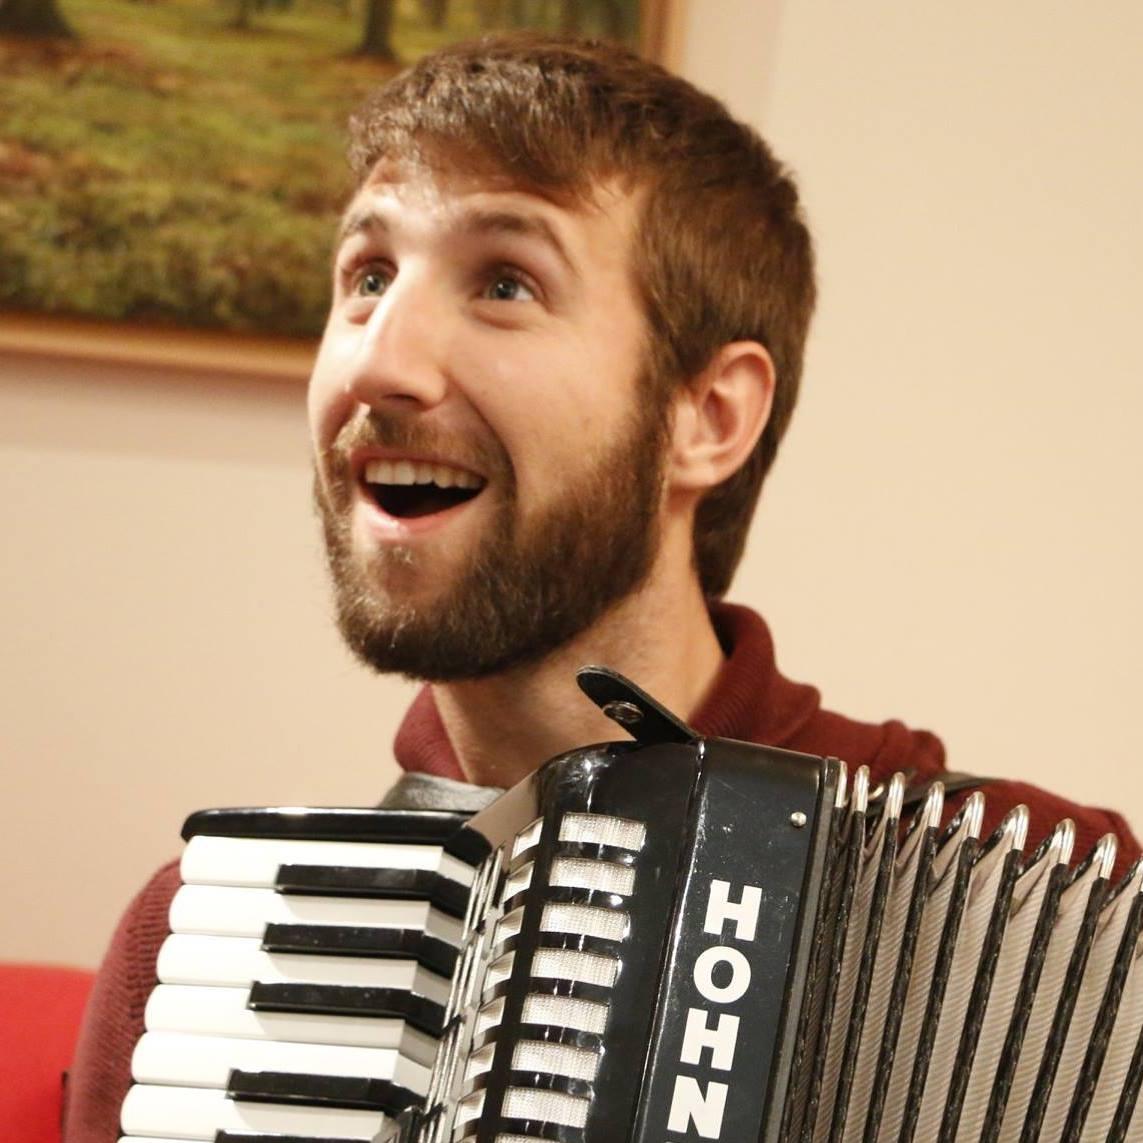 Enric Bisbe Gil, playing the accordion